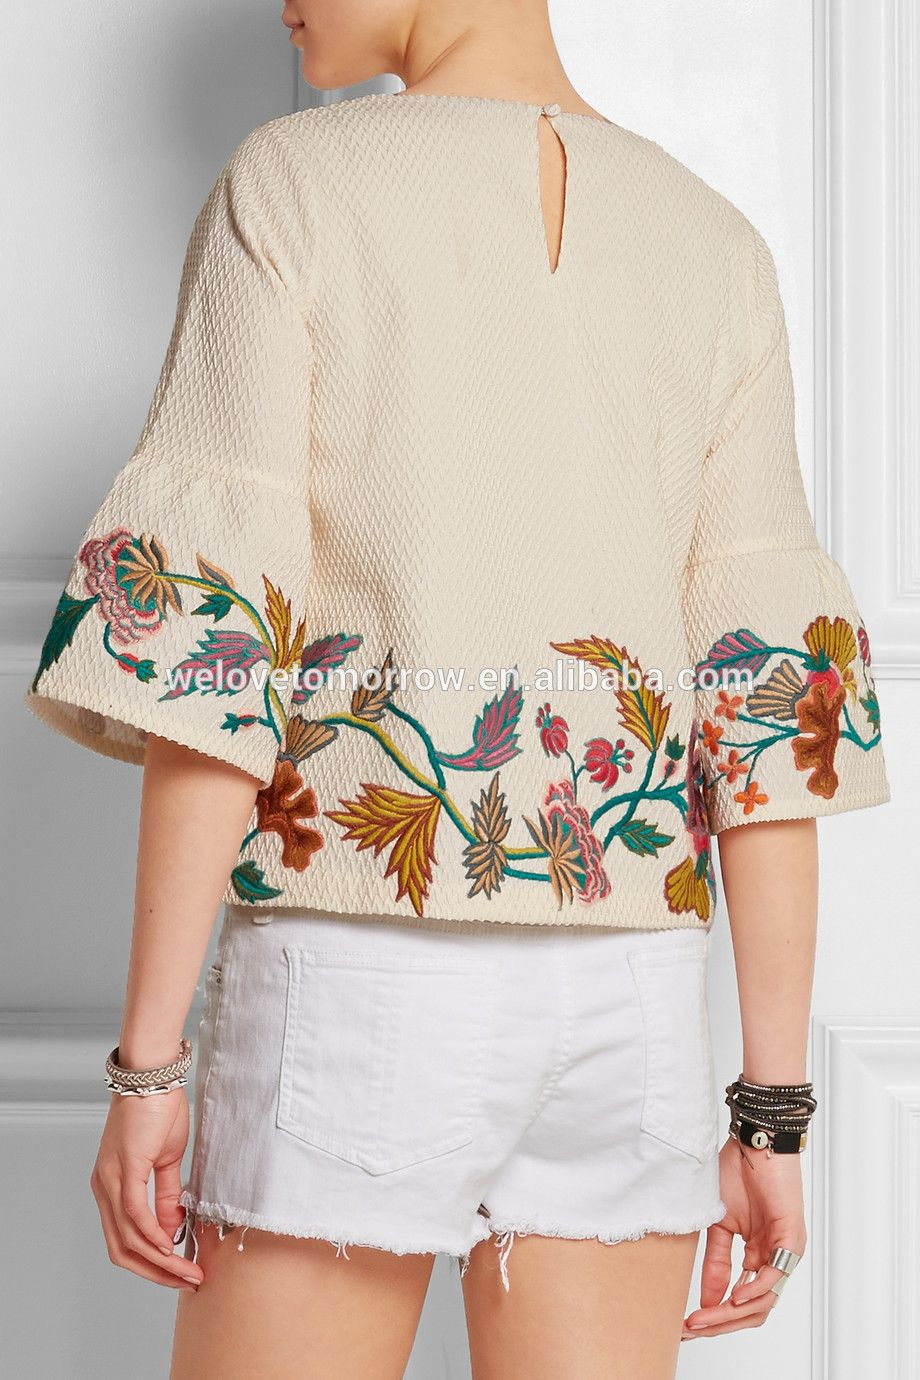 diseños de bordados a mano para blusas - Поиск в Google | !łatwe do ...